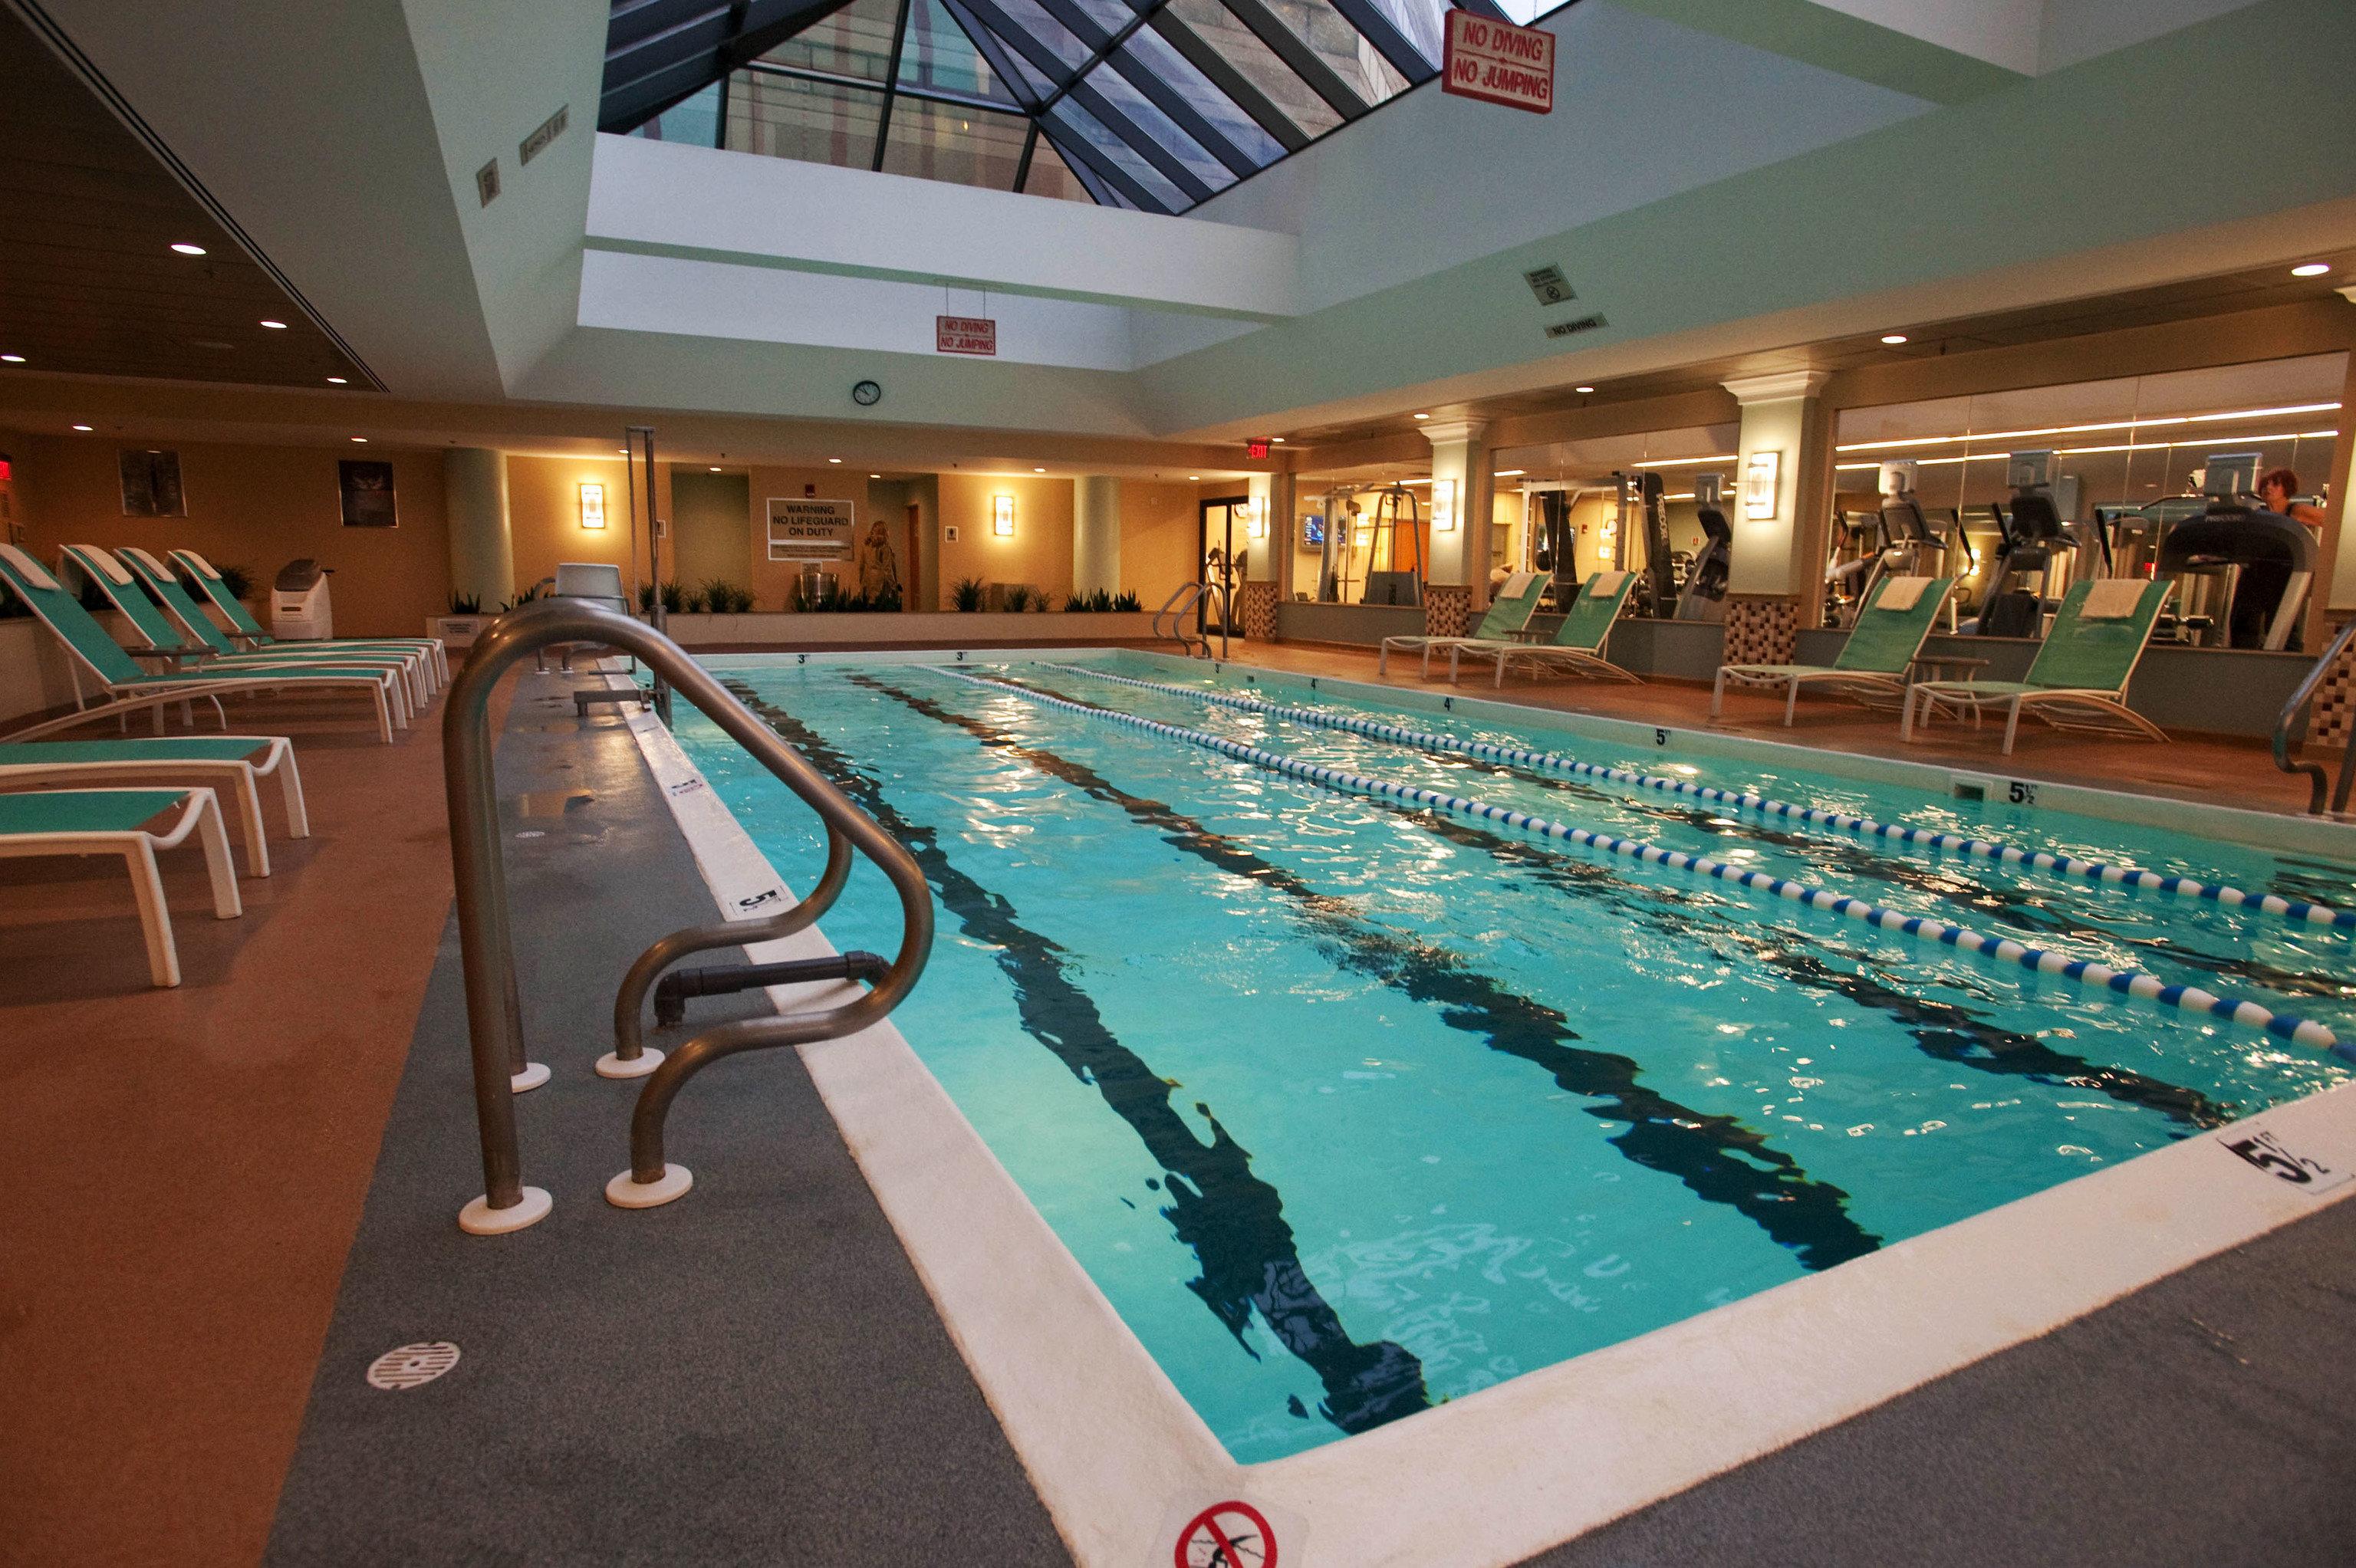 swimming pool leisure leisure centre billiard room Resort recreation room